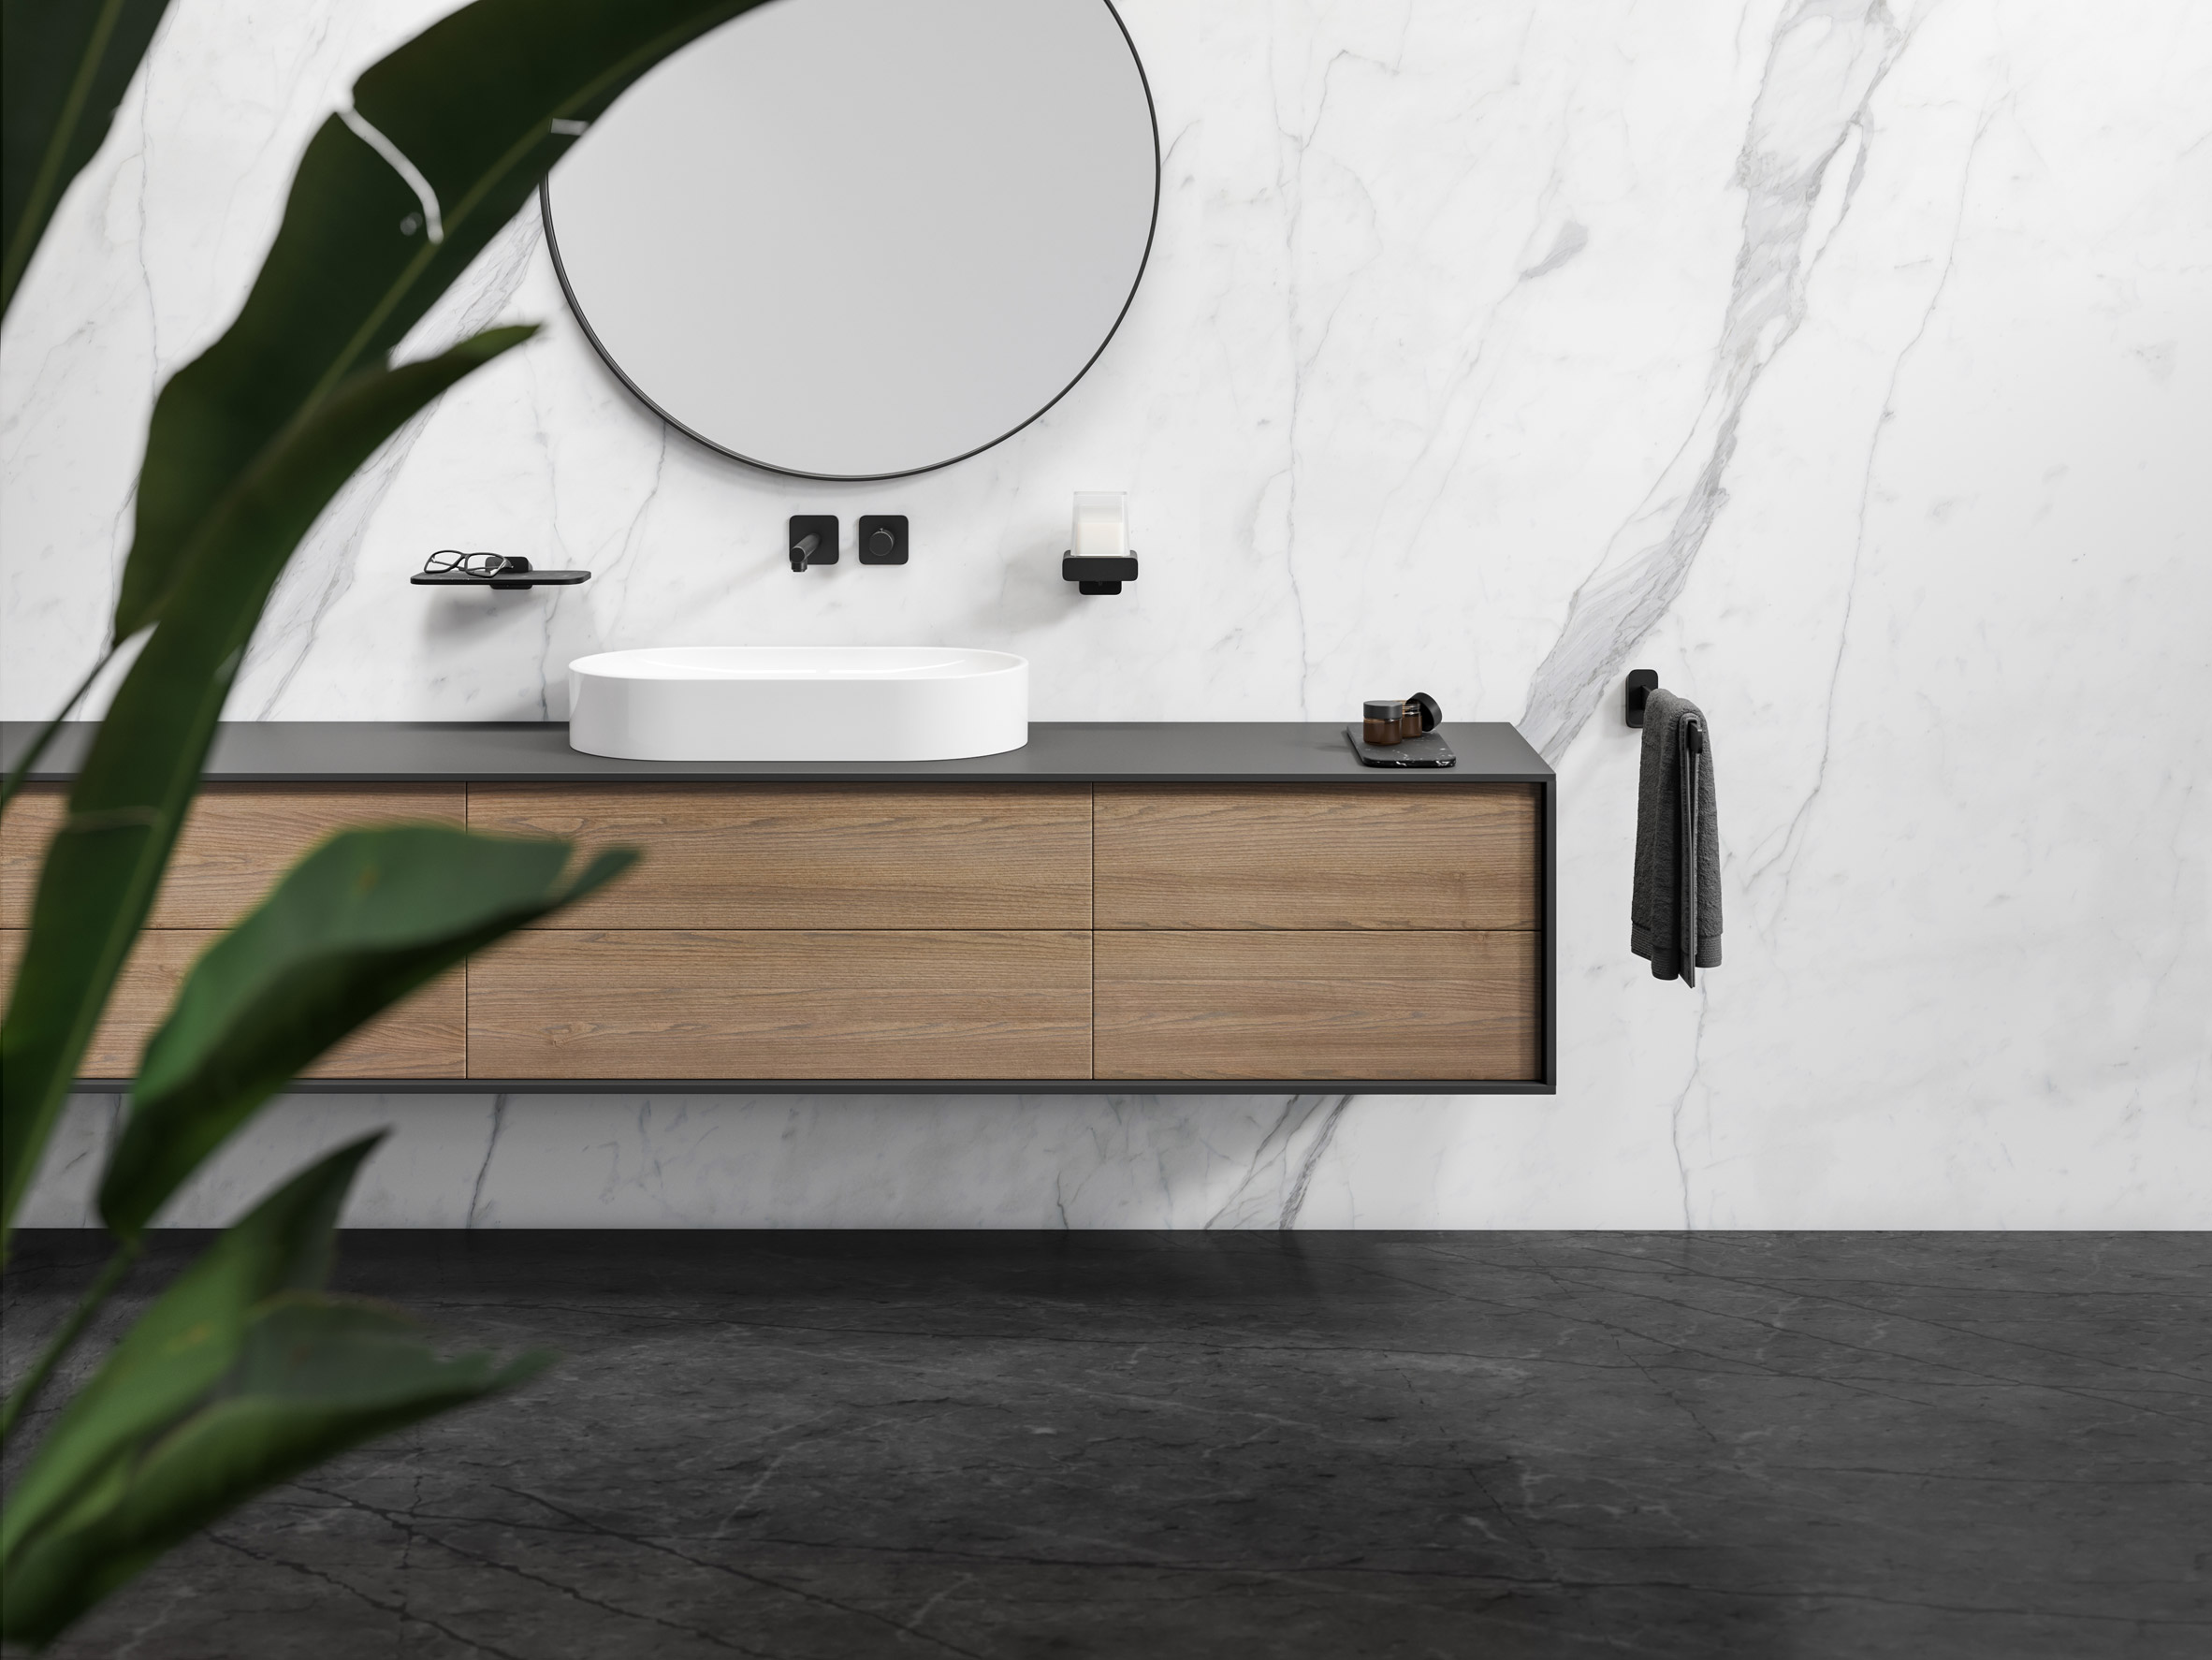 Black 45-centimetre towel rail by Geesa in elegant bathroom